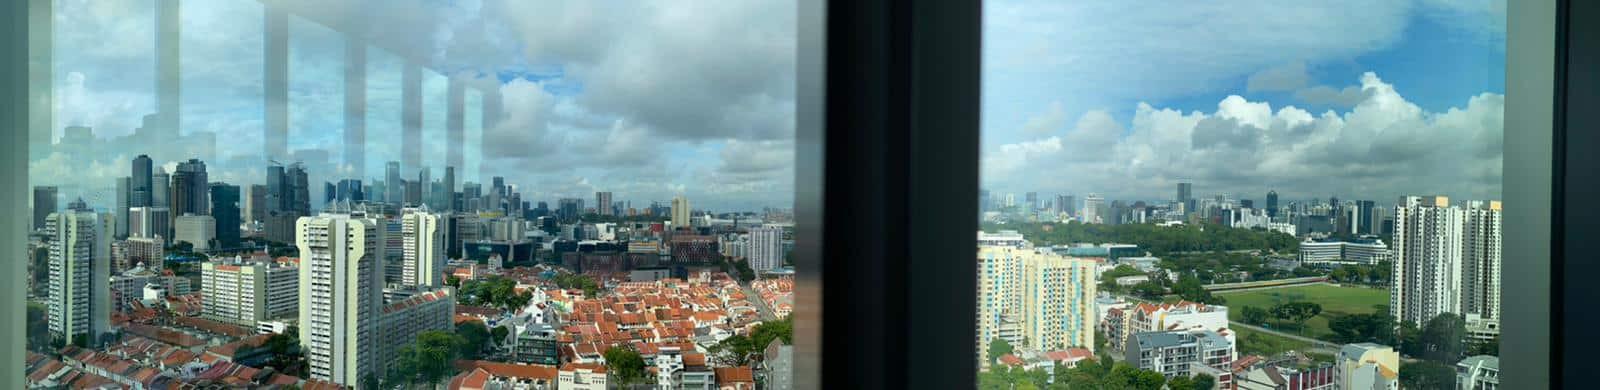 CBD view from Centrium Square